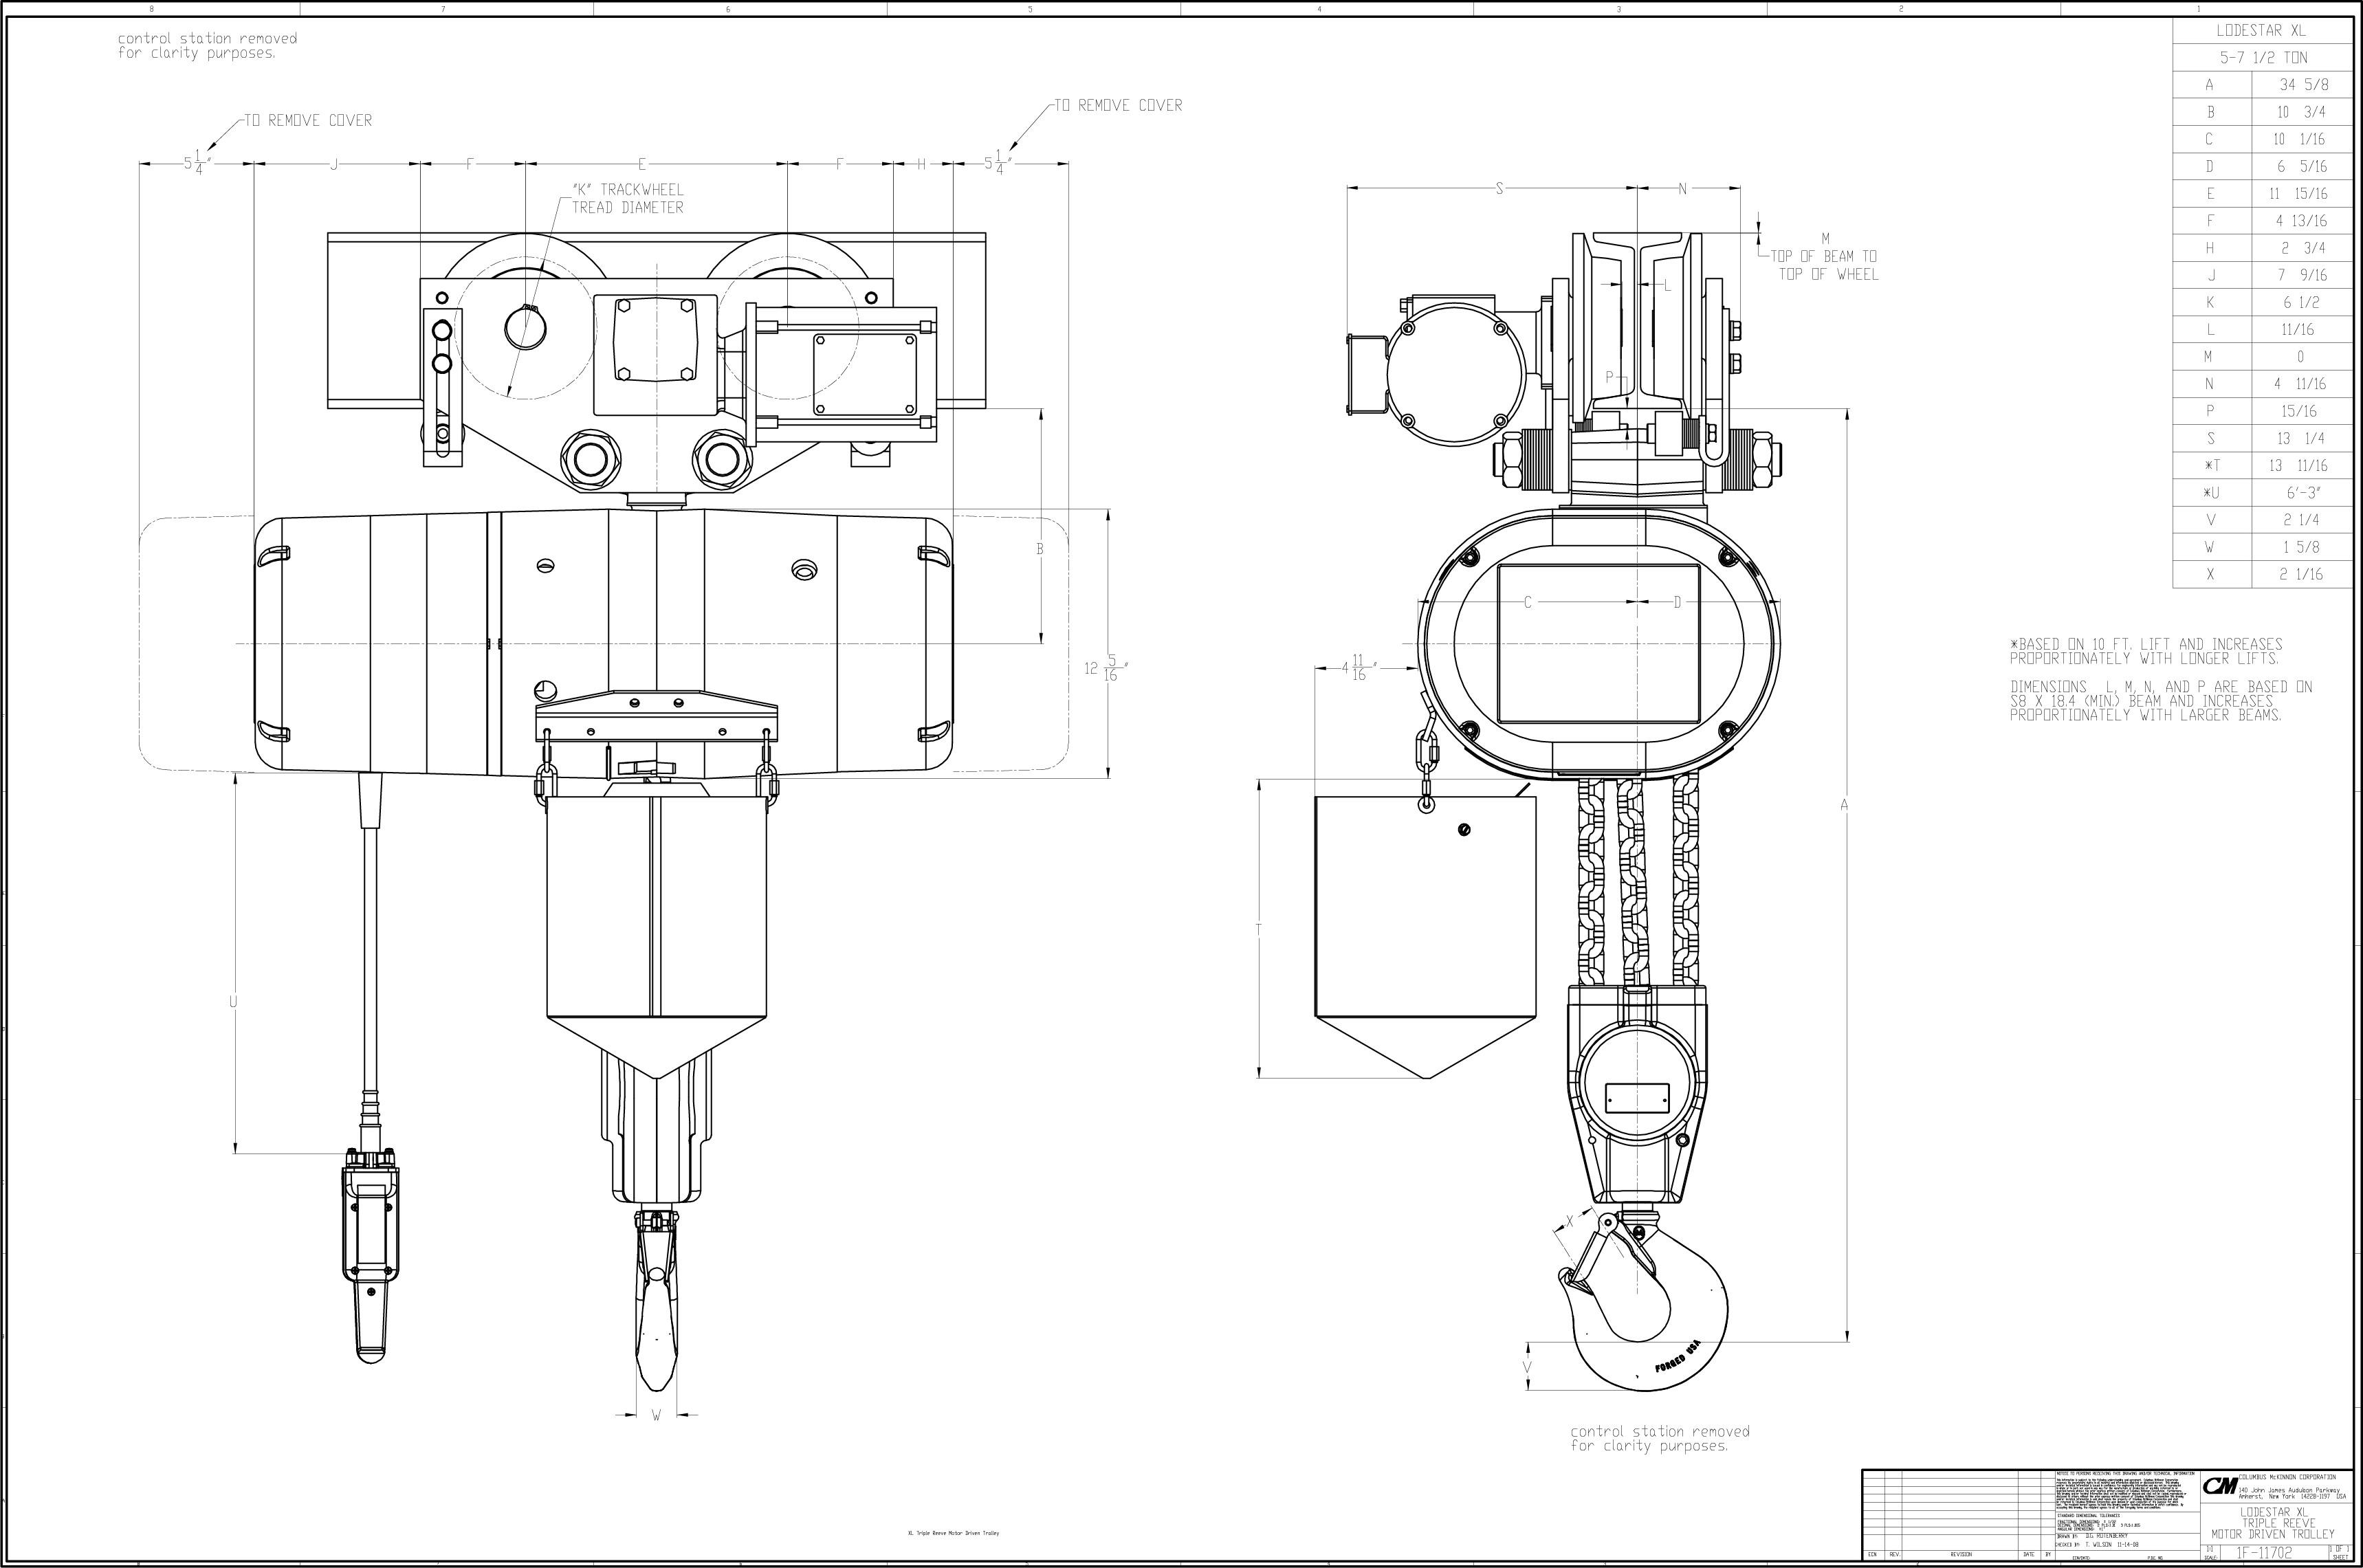 110 electric hoist wiring diagram power cord